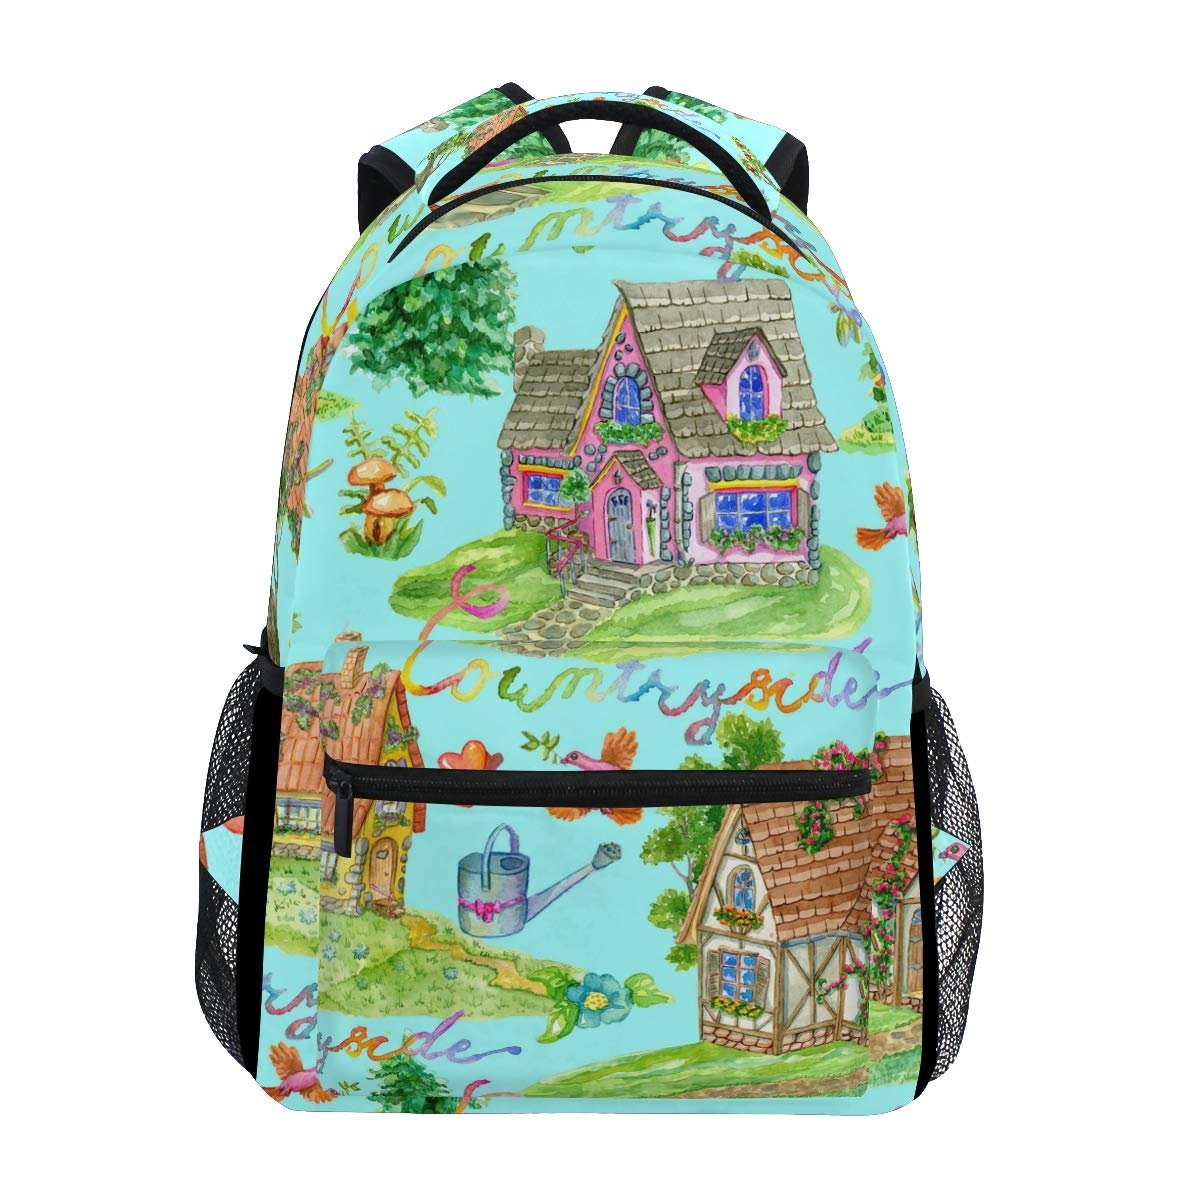 AHOMY ガールズ スクールバックパック 水彩 ガーデンハウス 鳥 カレッジブックバッグ レディース 旅行 リュックサック   B07G82WLSD